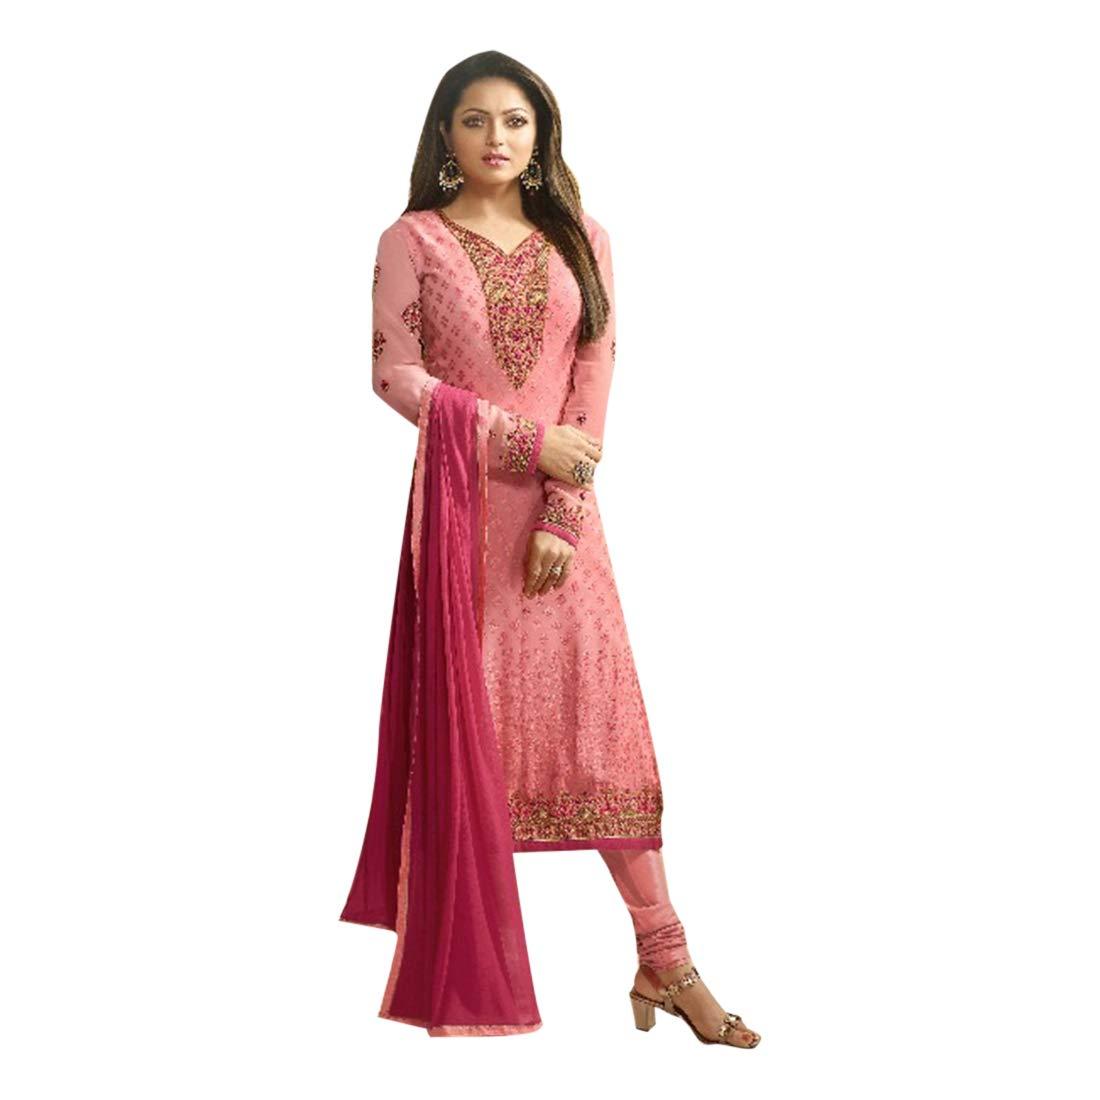 Pink Ethnic Brasso Santoon Heavy Embroidery Straight Salwar Kameez Bollywood Designer Indian Muslim 7263